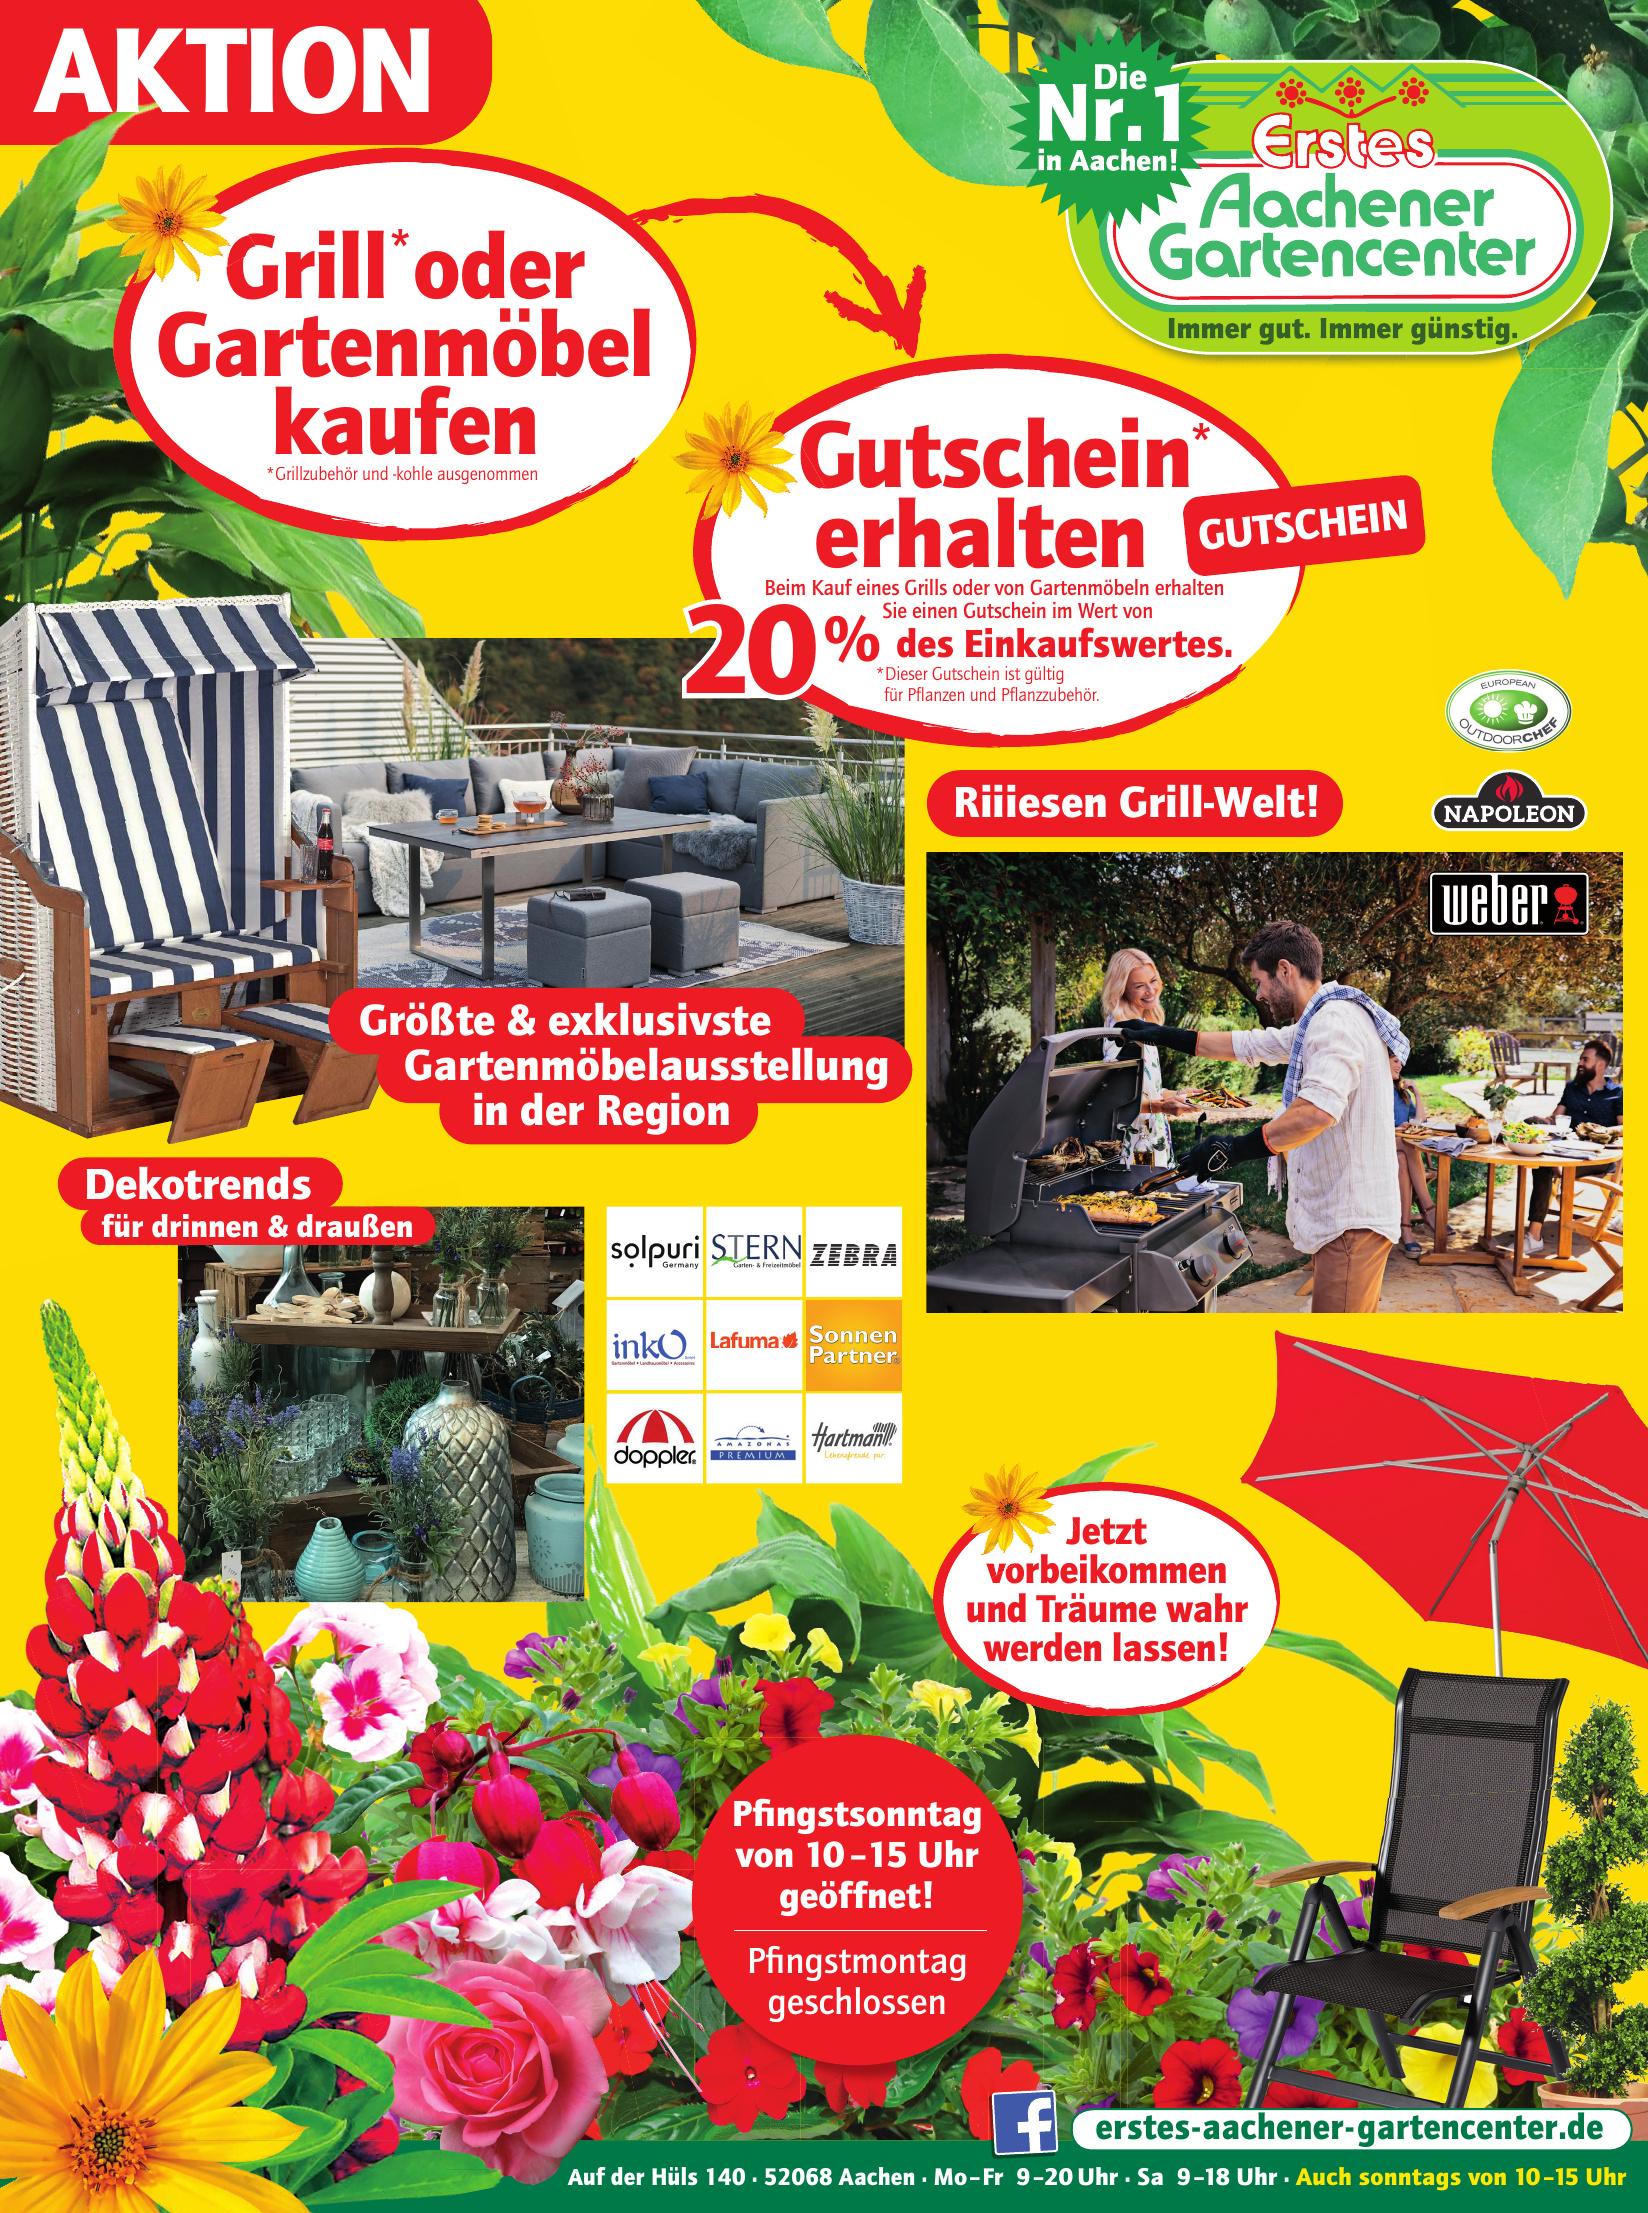 Erstes Aachener Gartencenter